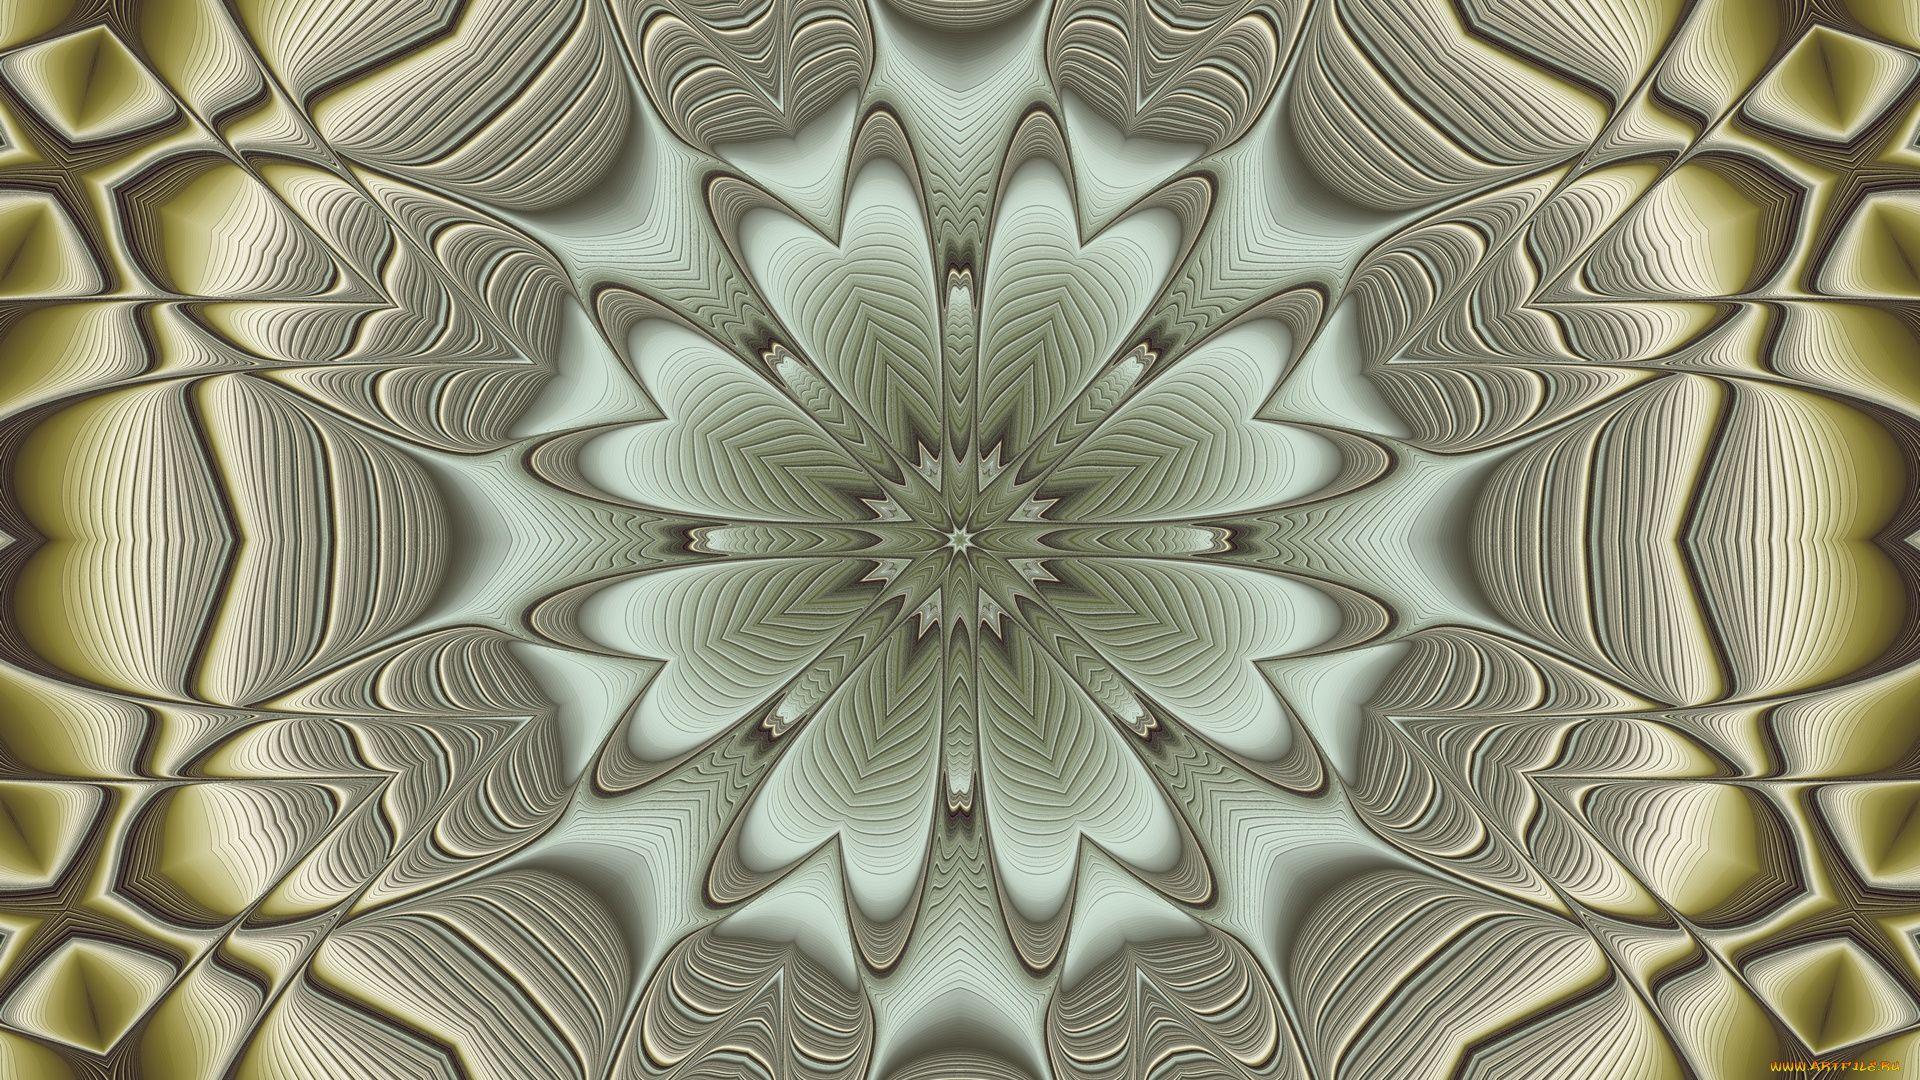 Kaleidoscope wallpaper photo full hd